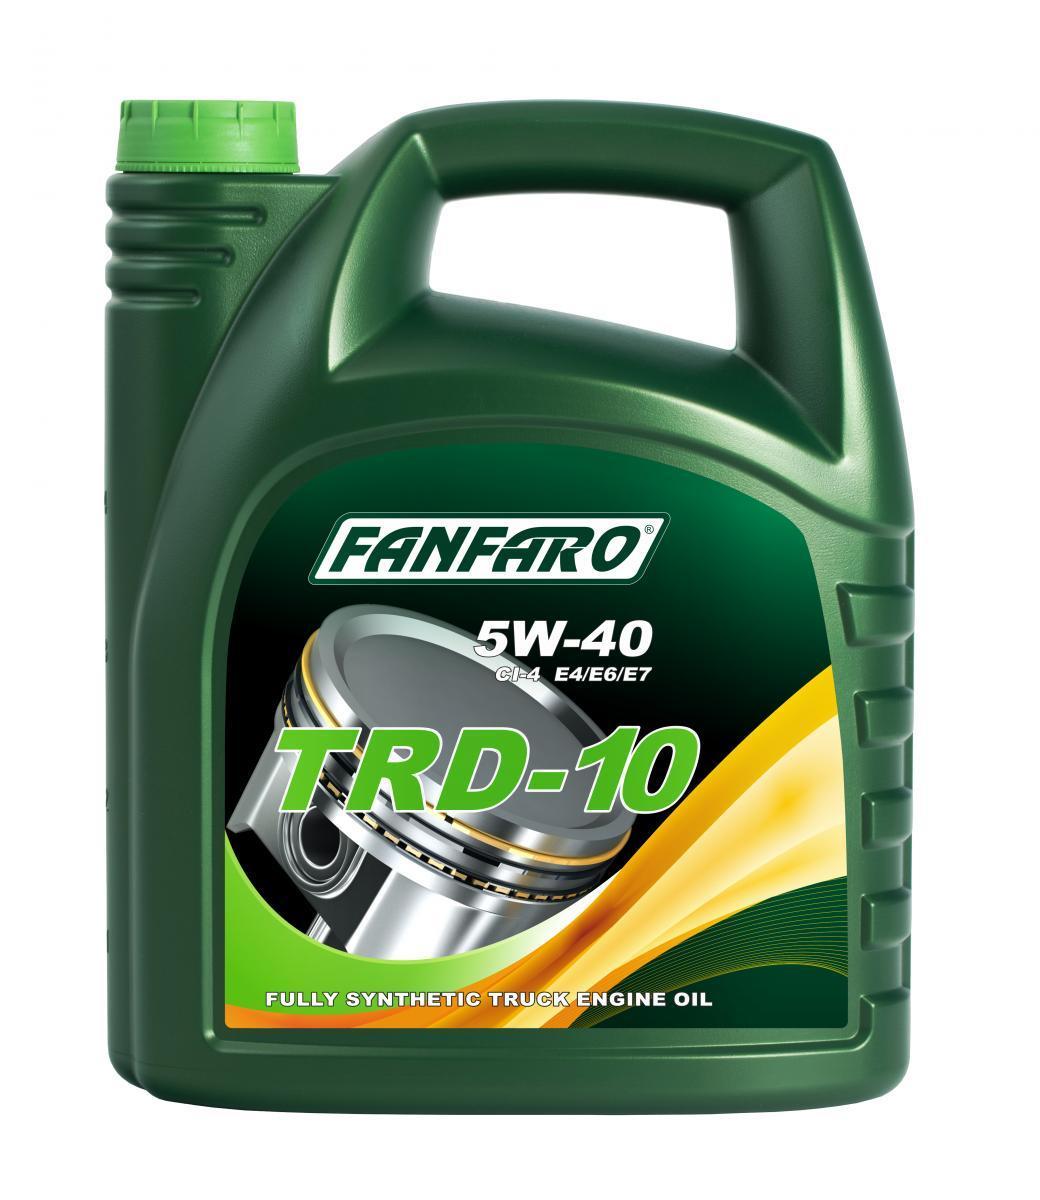 FF6110-5 FANFARO UHPD, TRD-10 5W-40, 5l, Synthetiköl Motoröl FF6110-5 günstig kaufen